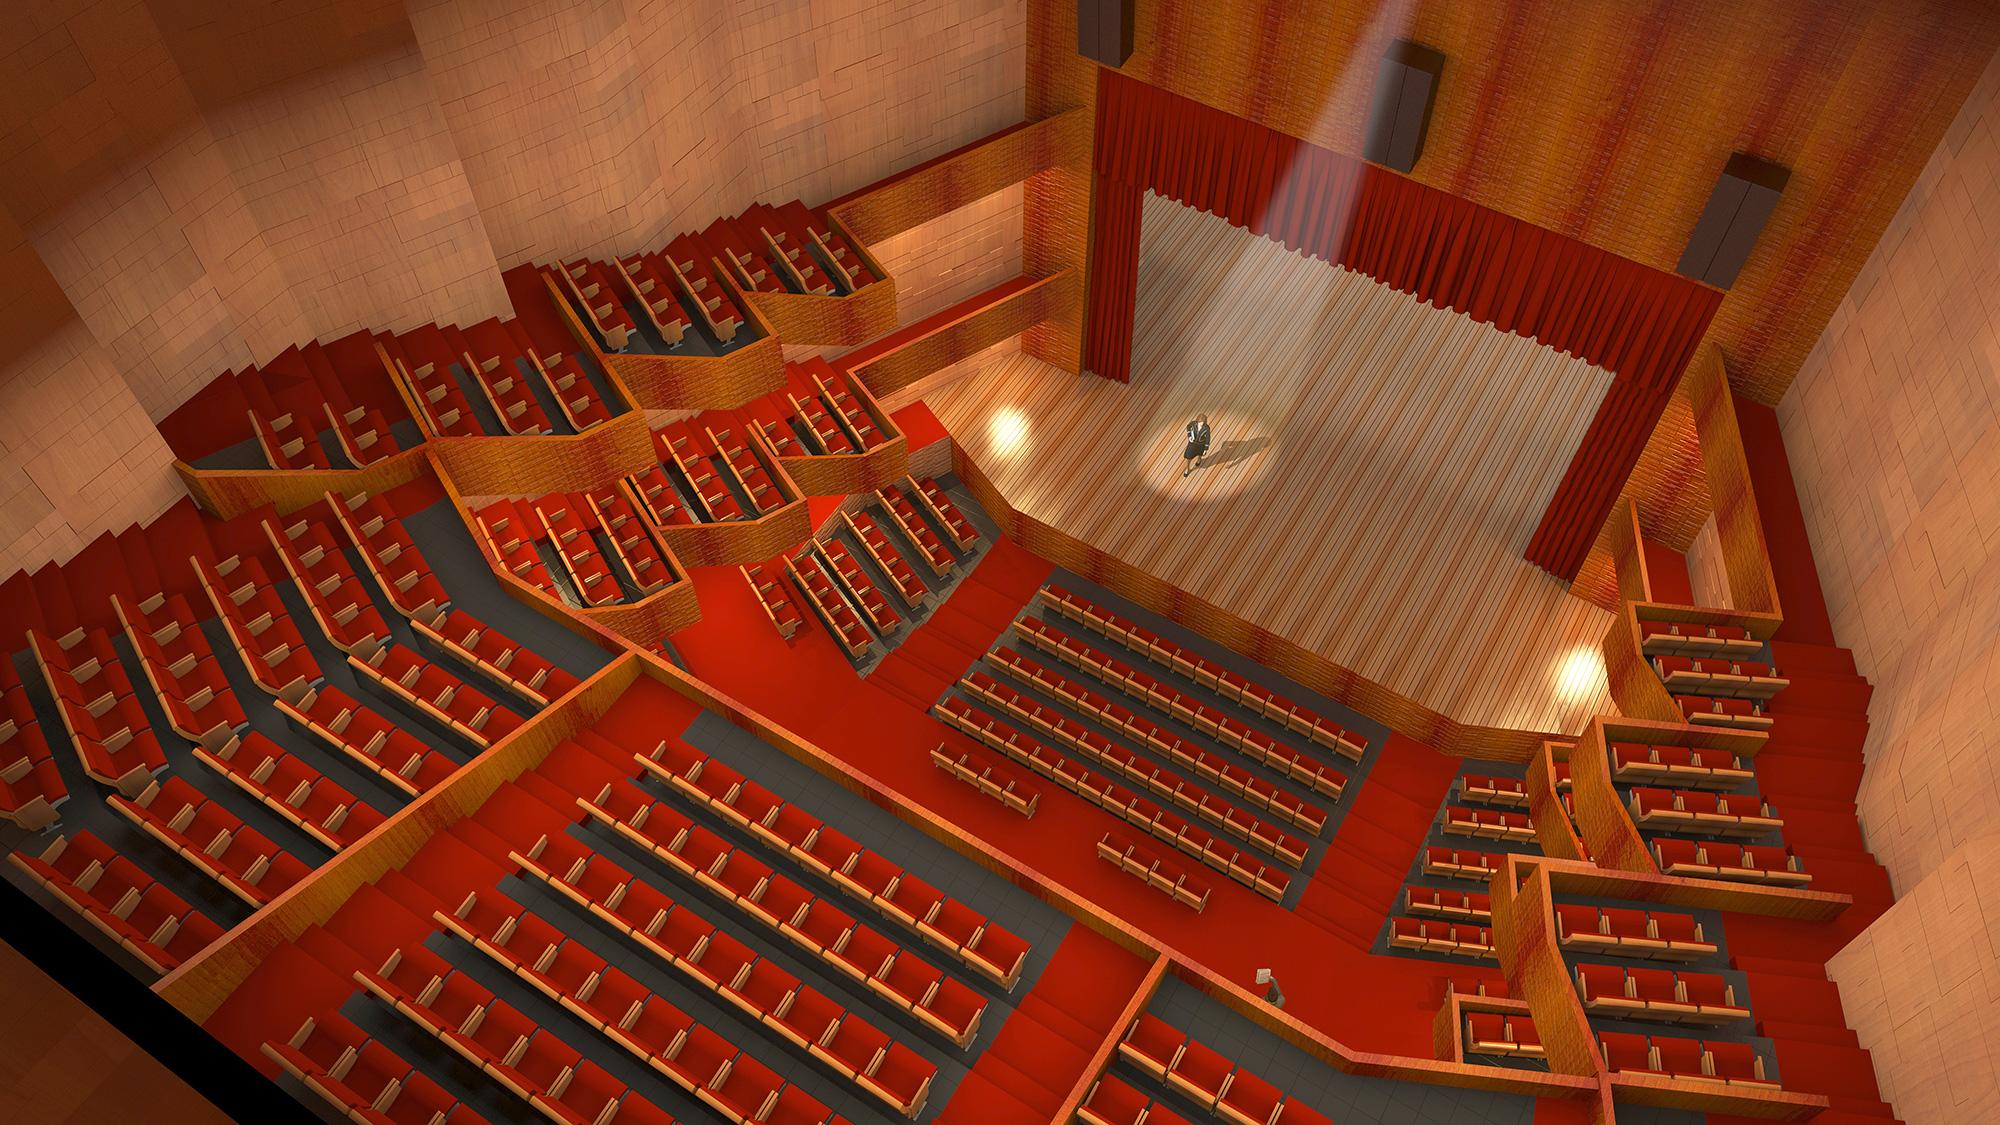 Teatro Municipal de Louveira Slide 05